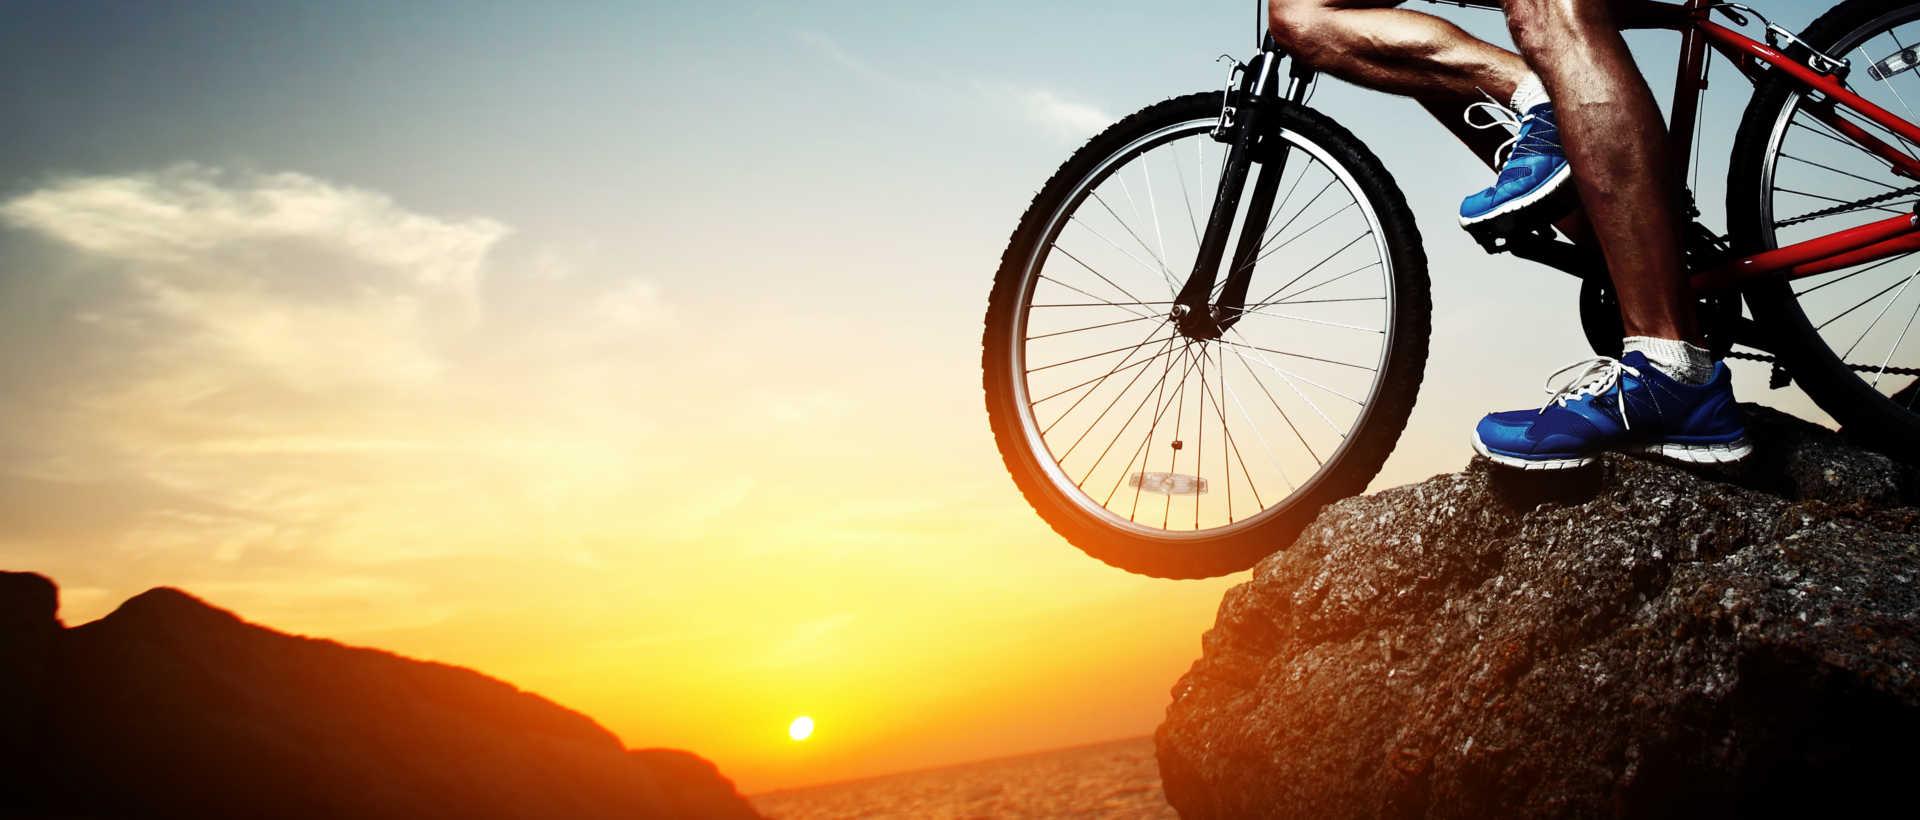 cliff_biker